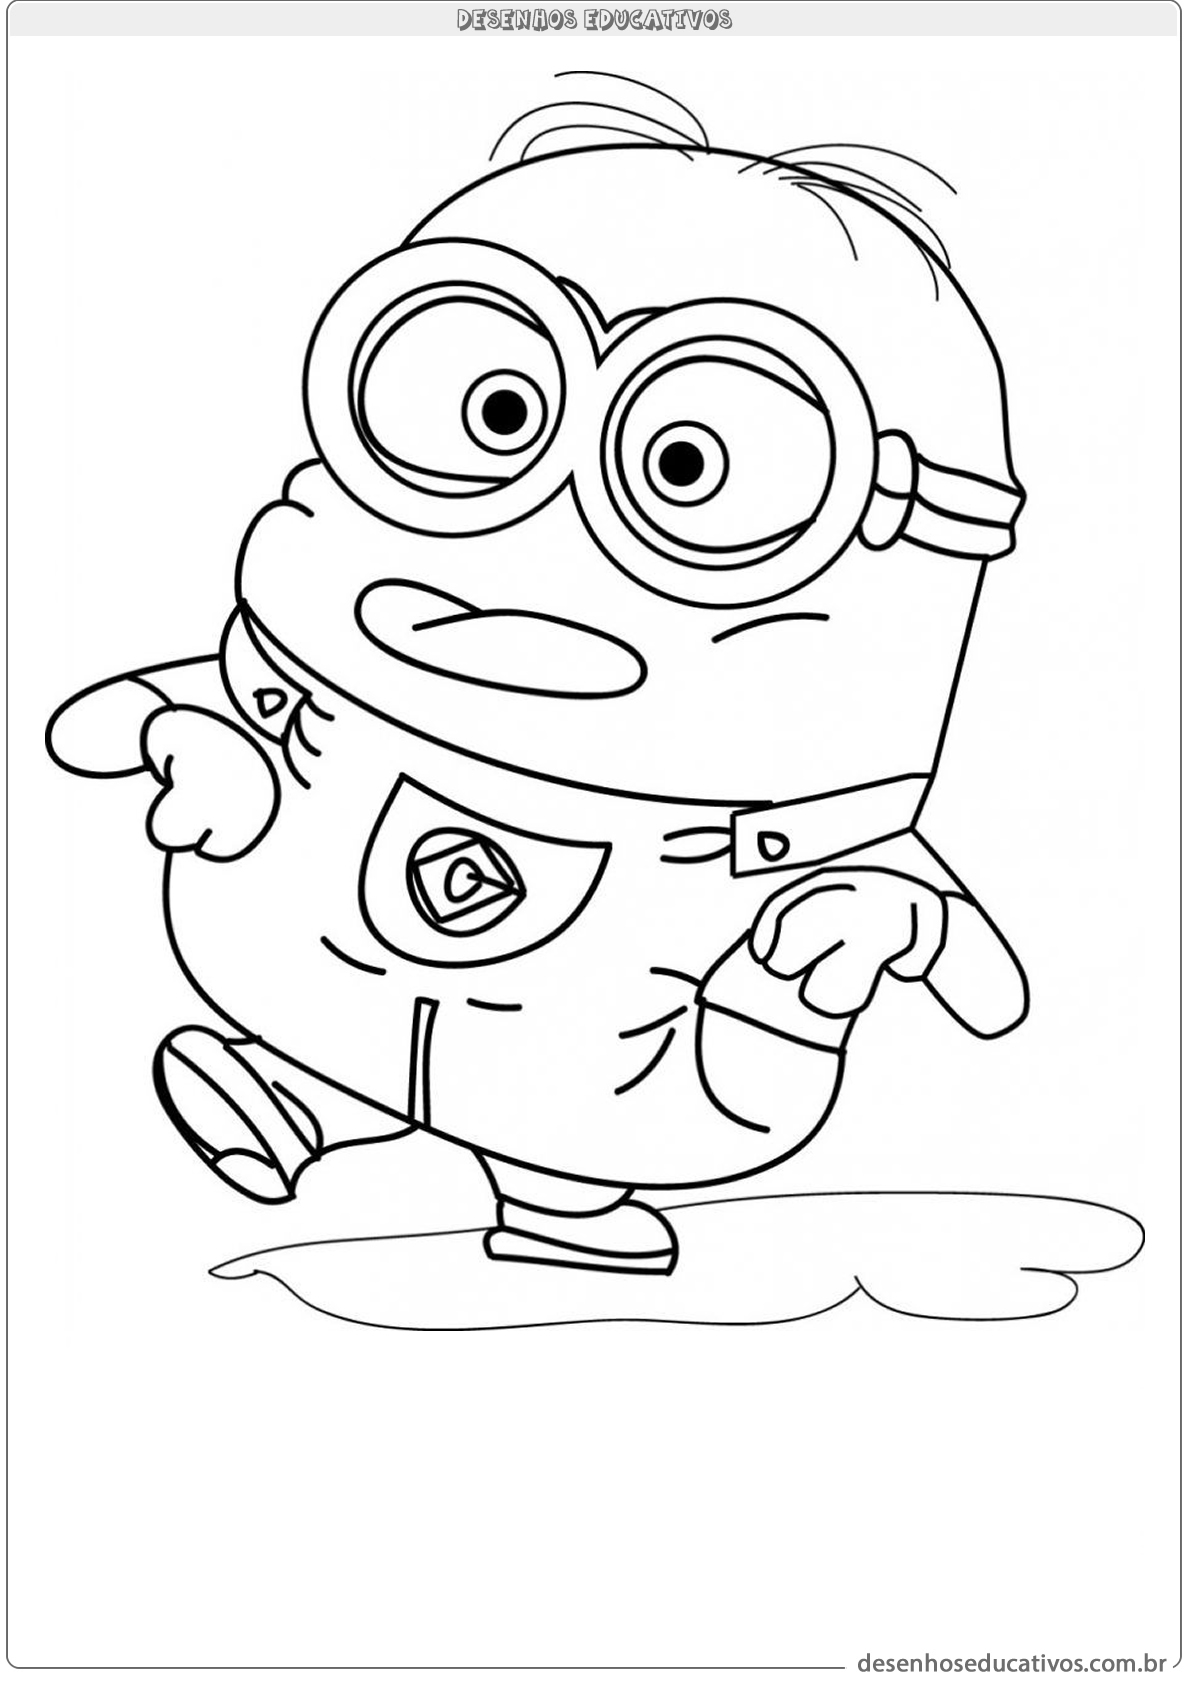 Desenhos Educativos Minions Vamos Colorir Desenhos Educativos